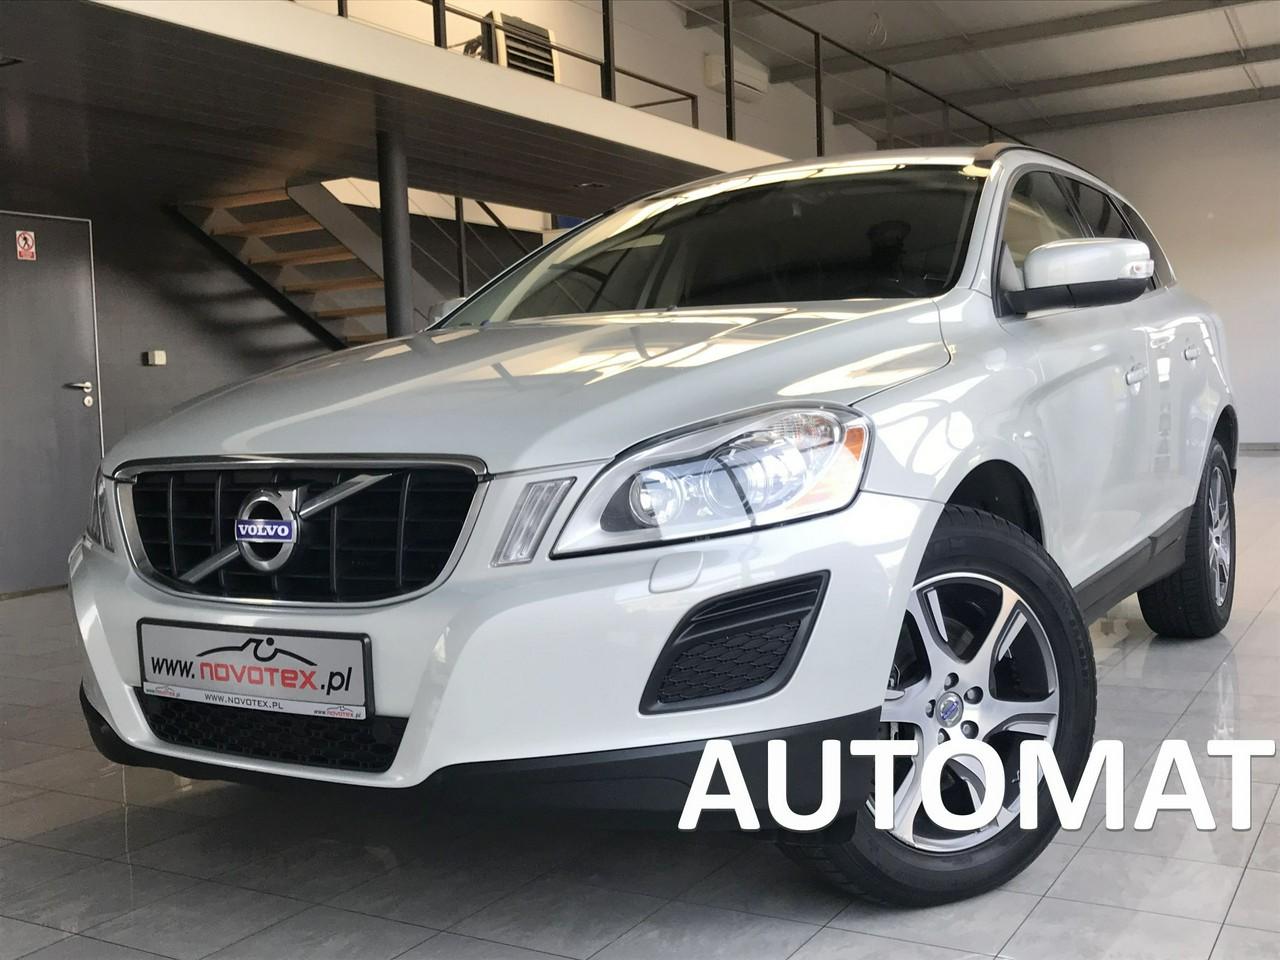 Volvo XC 60 2.0D*Summum*automat*xenon*ALU 18*serwis w ASO Volvo*gwarancja VIP